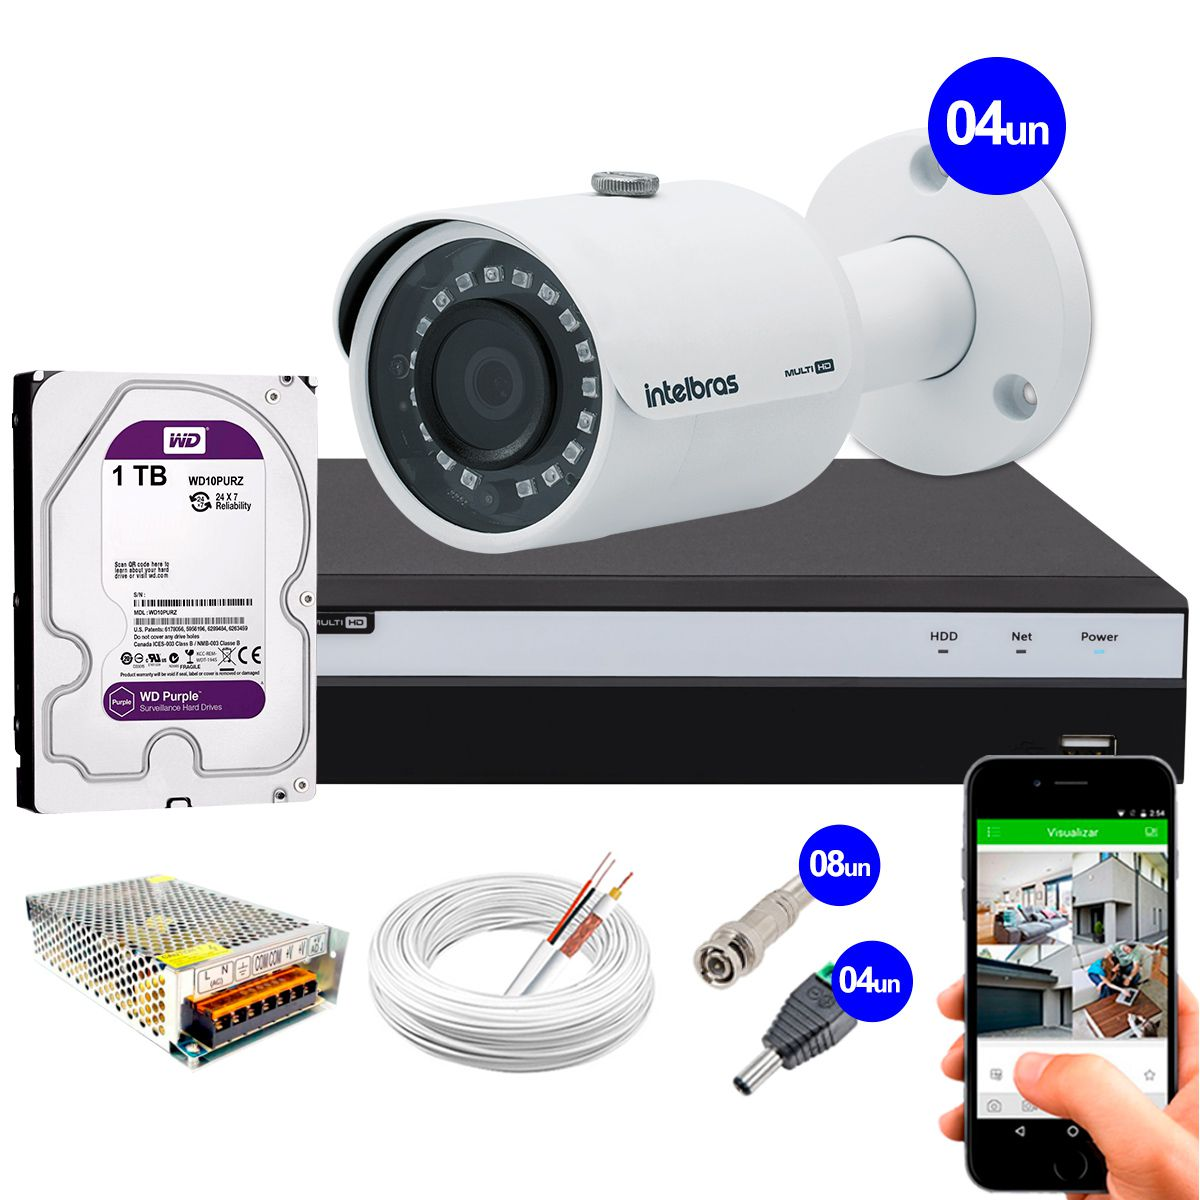 Kit 4 Câmeras de Segurança 4MP 2k Intelbras VHD 3430 B + DVR Intelbras 4K + HD WD Purple + Acessórios  - Tudo Forte